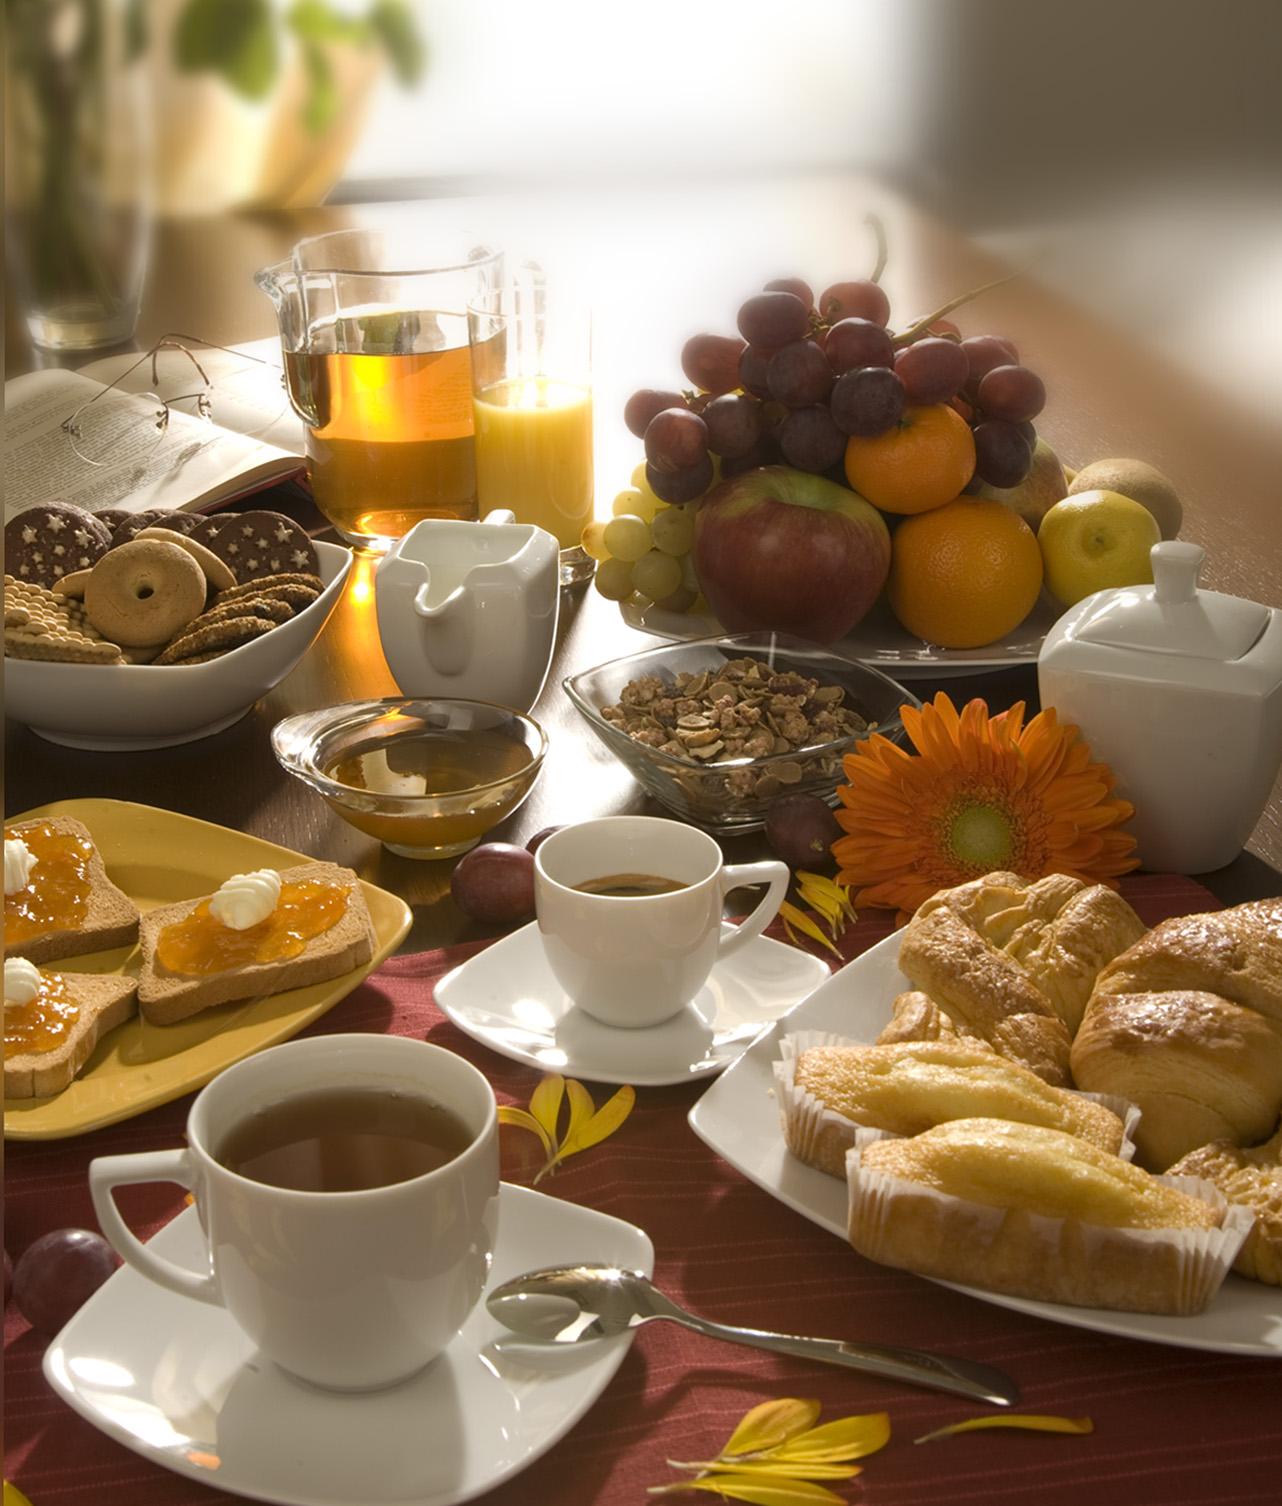 The first italian breakfast - 01